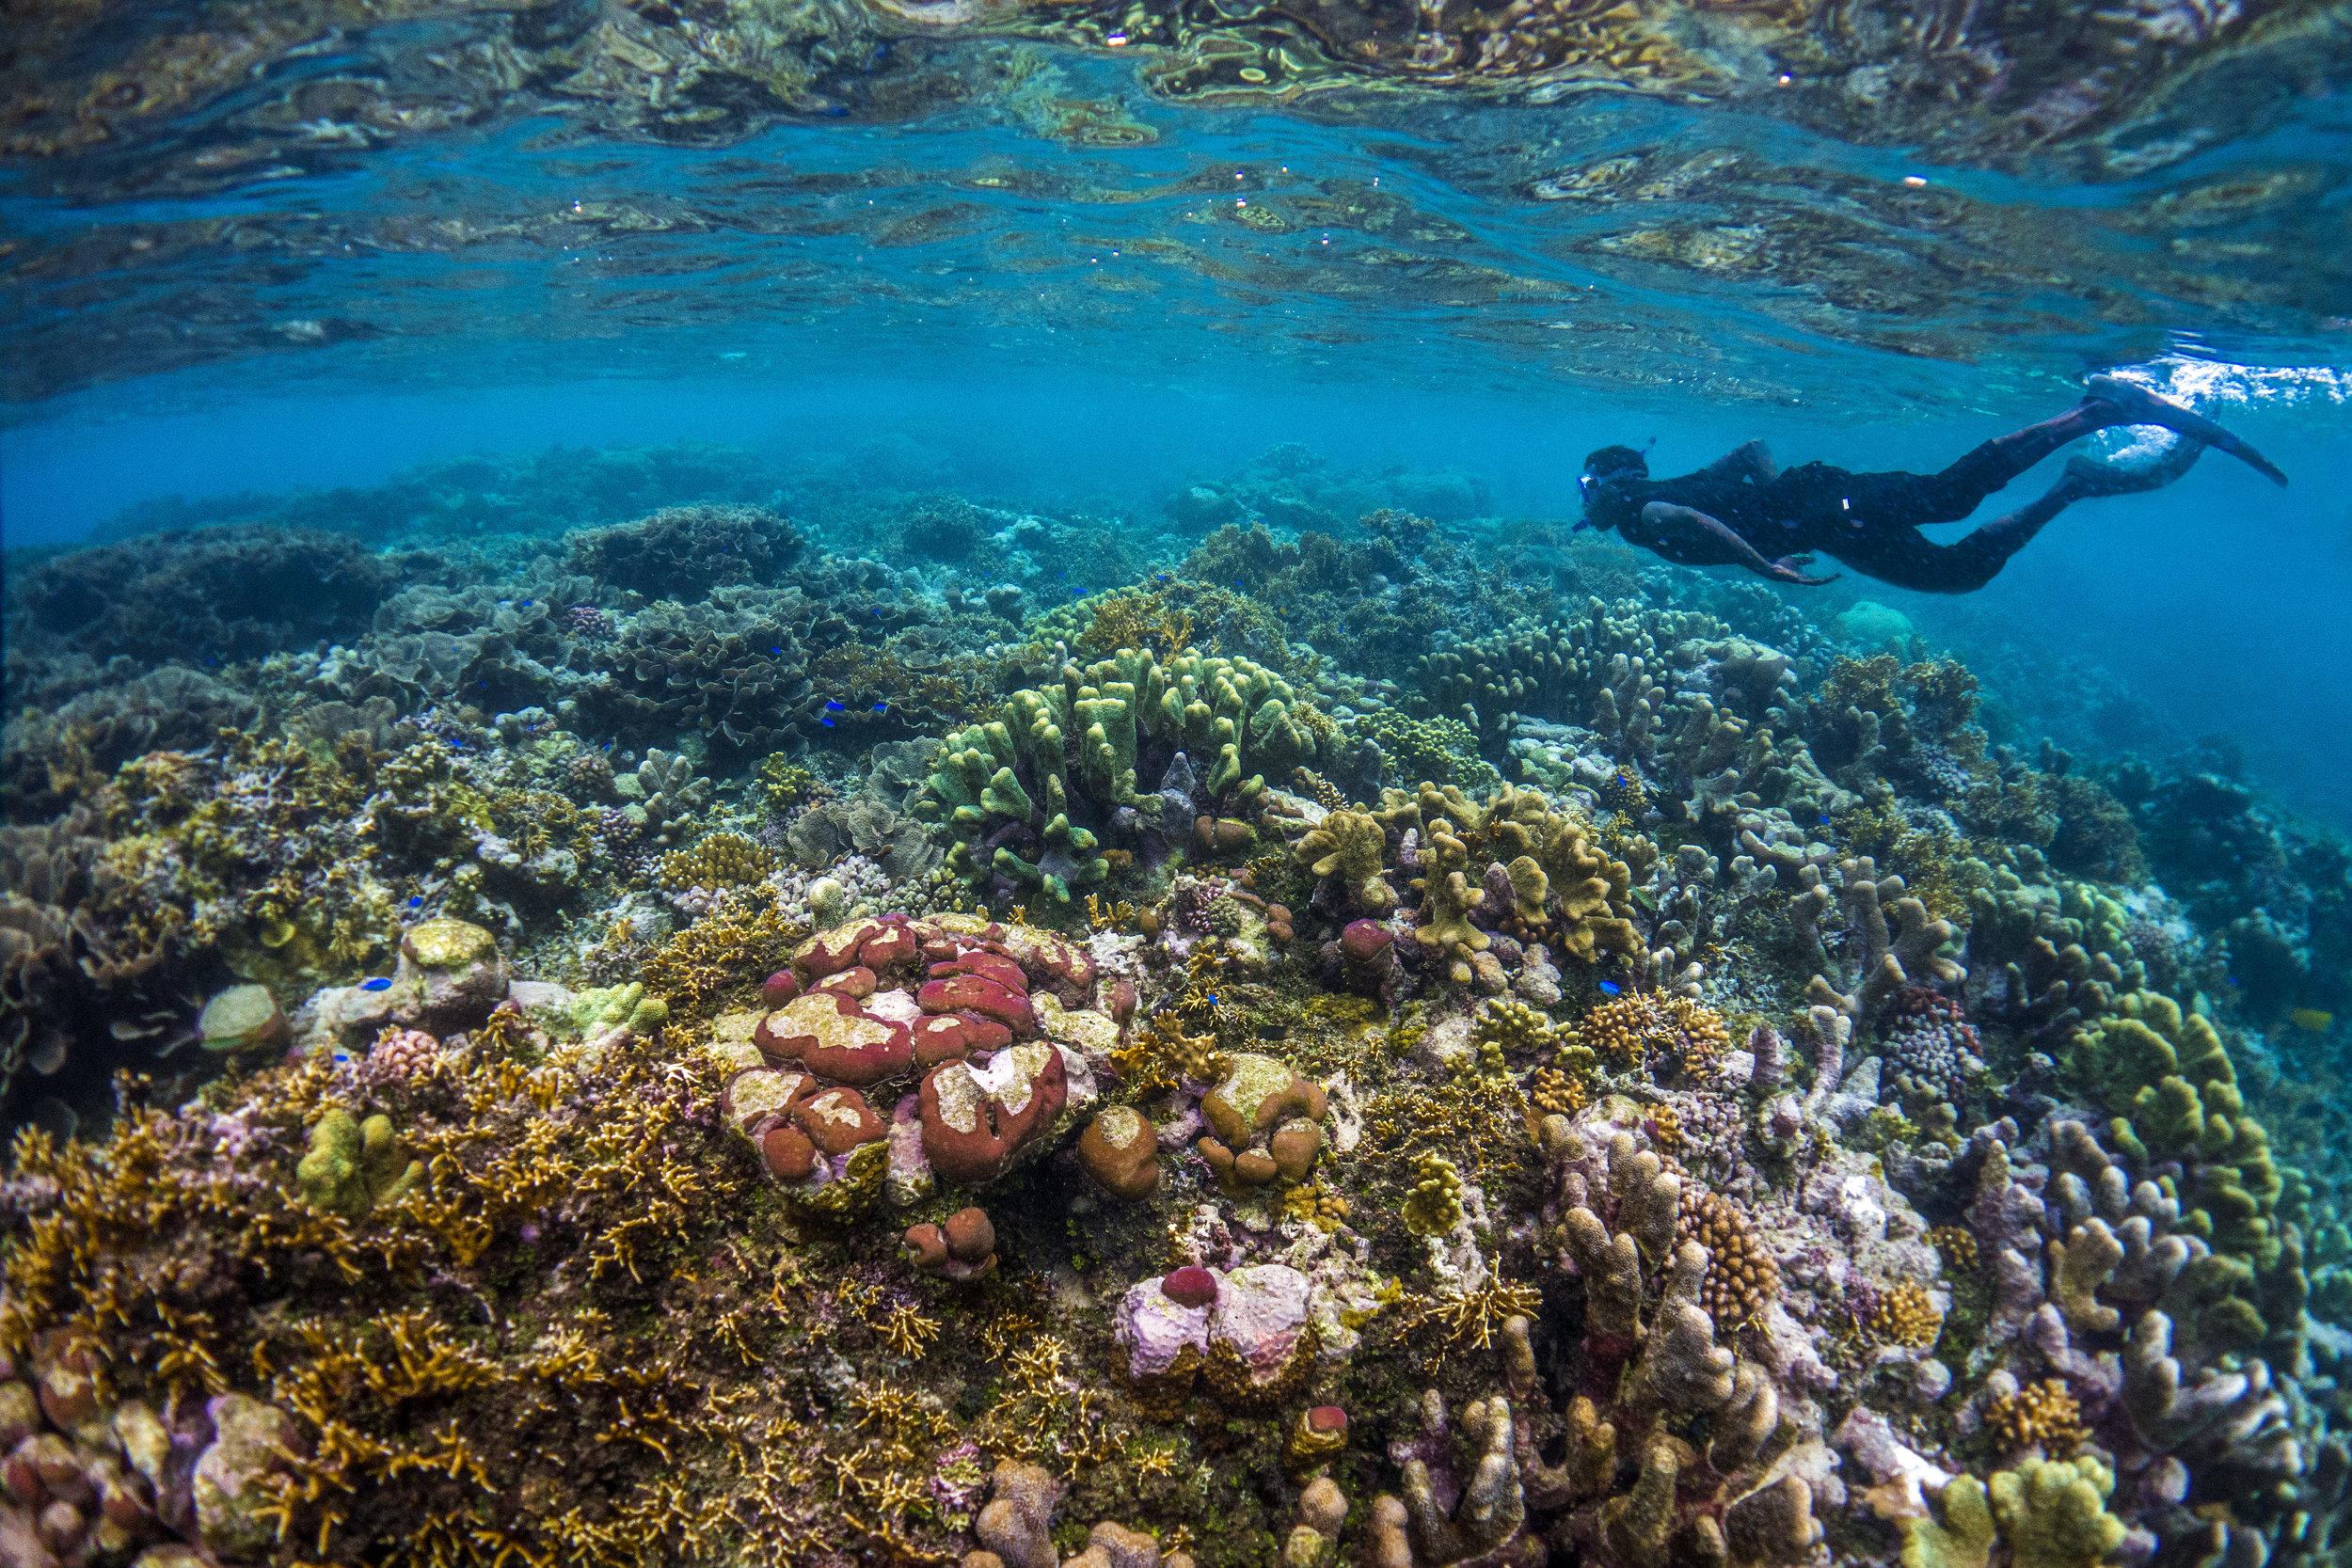 SIVB_0006_DK_2016 - Snorkeling at Marau Sound.jpg